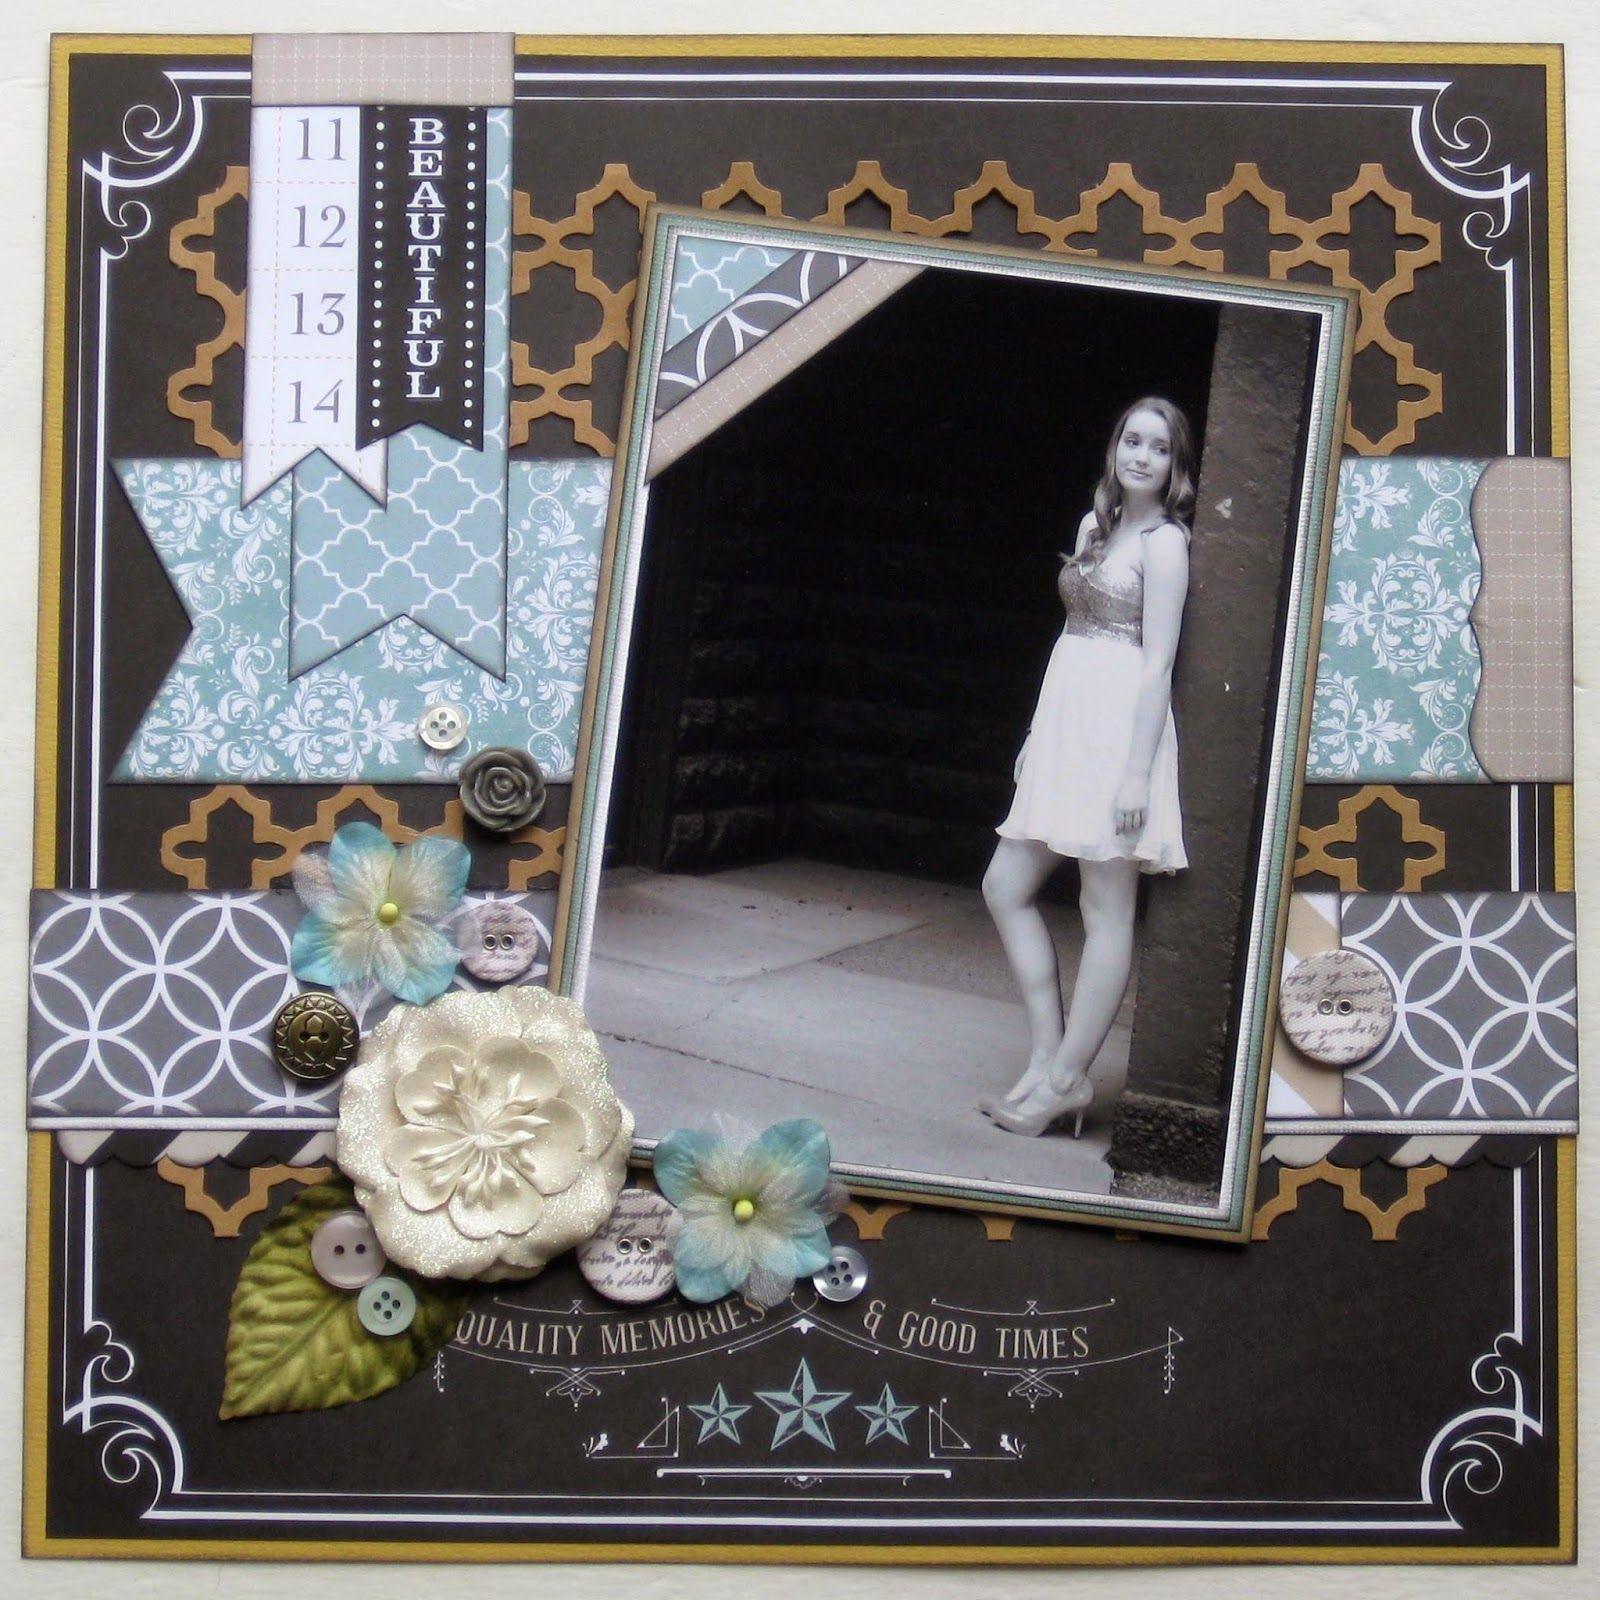 Scrapbook ideas multiple pictures - Multiple Teresa Collins Designs Scrapbook Layouts